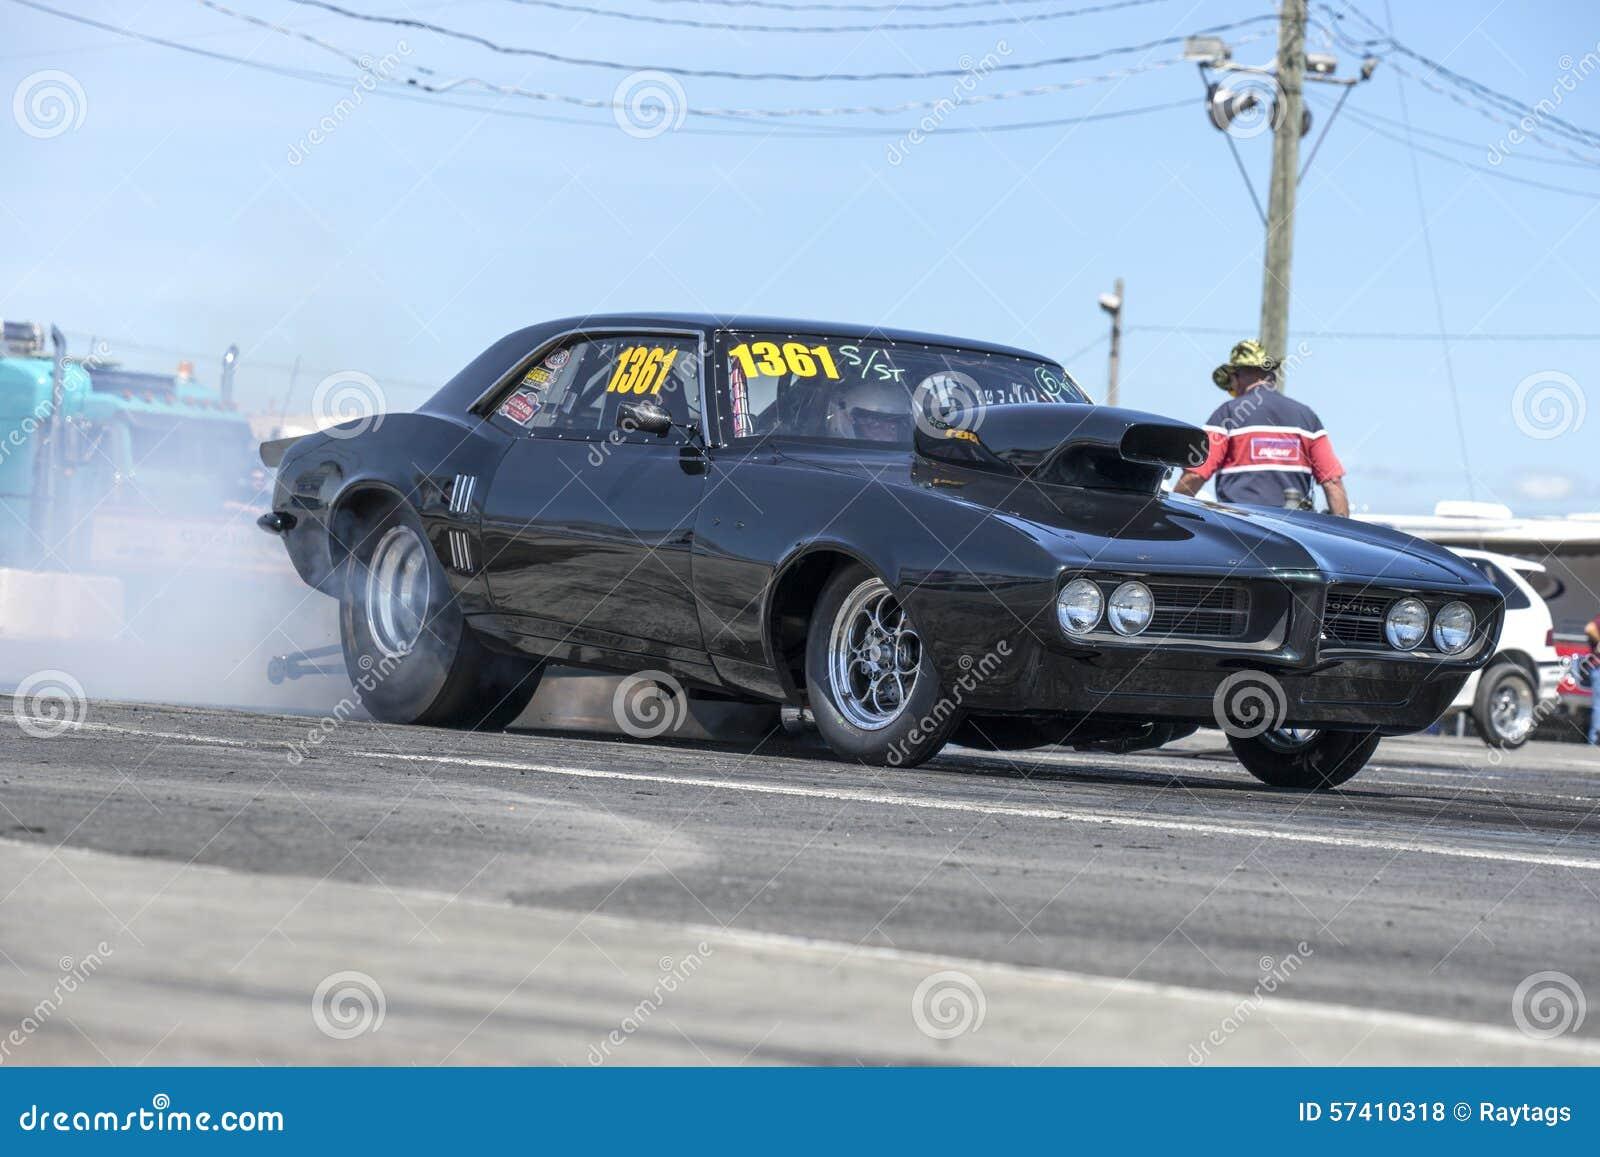 Drag racing editorial stock photo. Image of machine, mechanic - 57410318